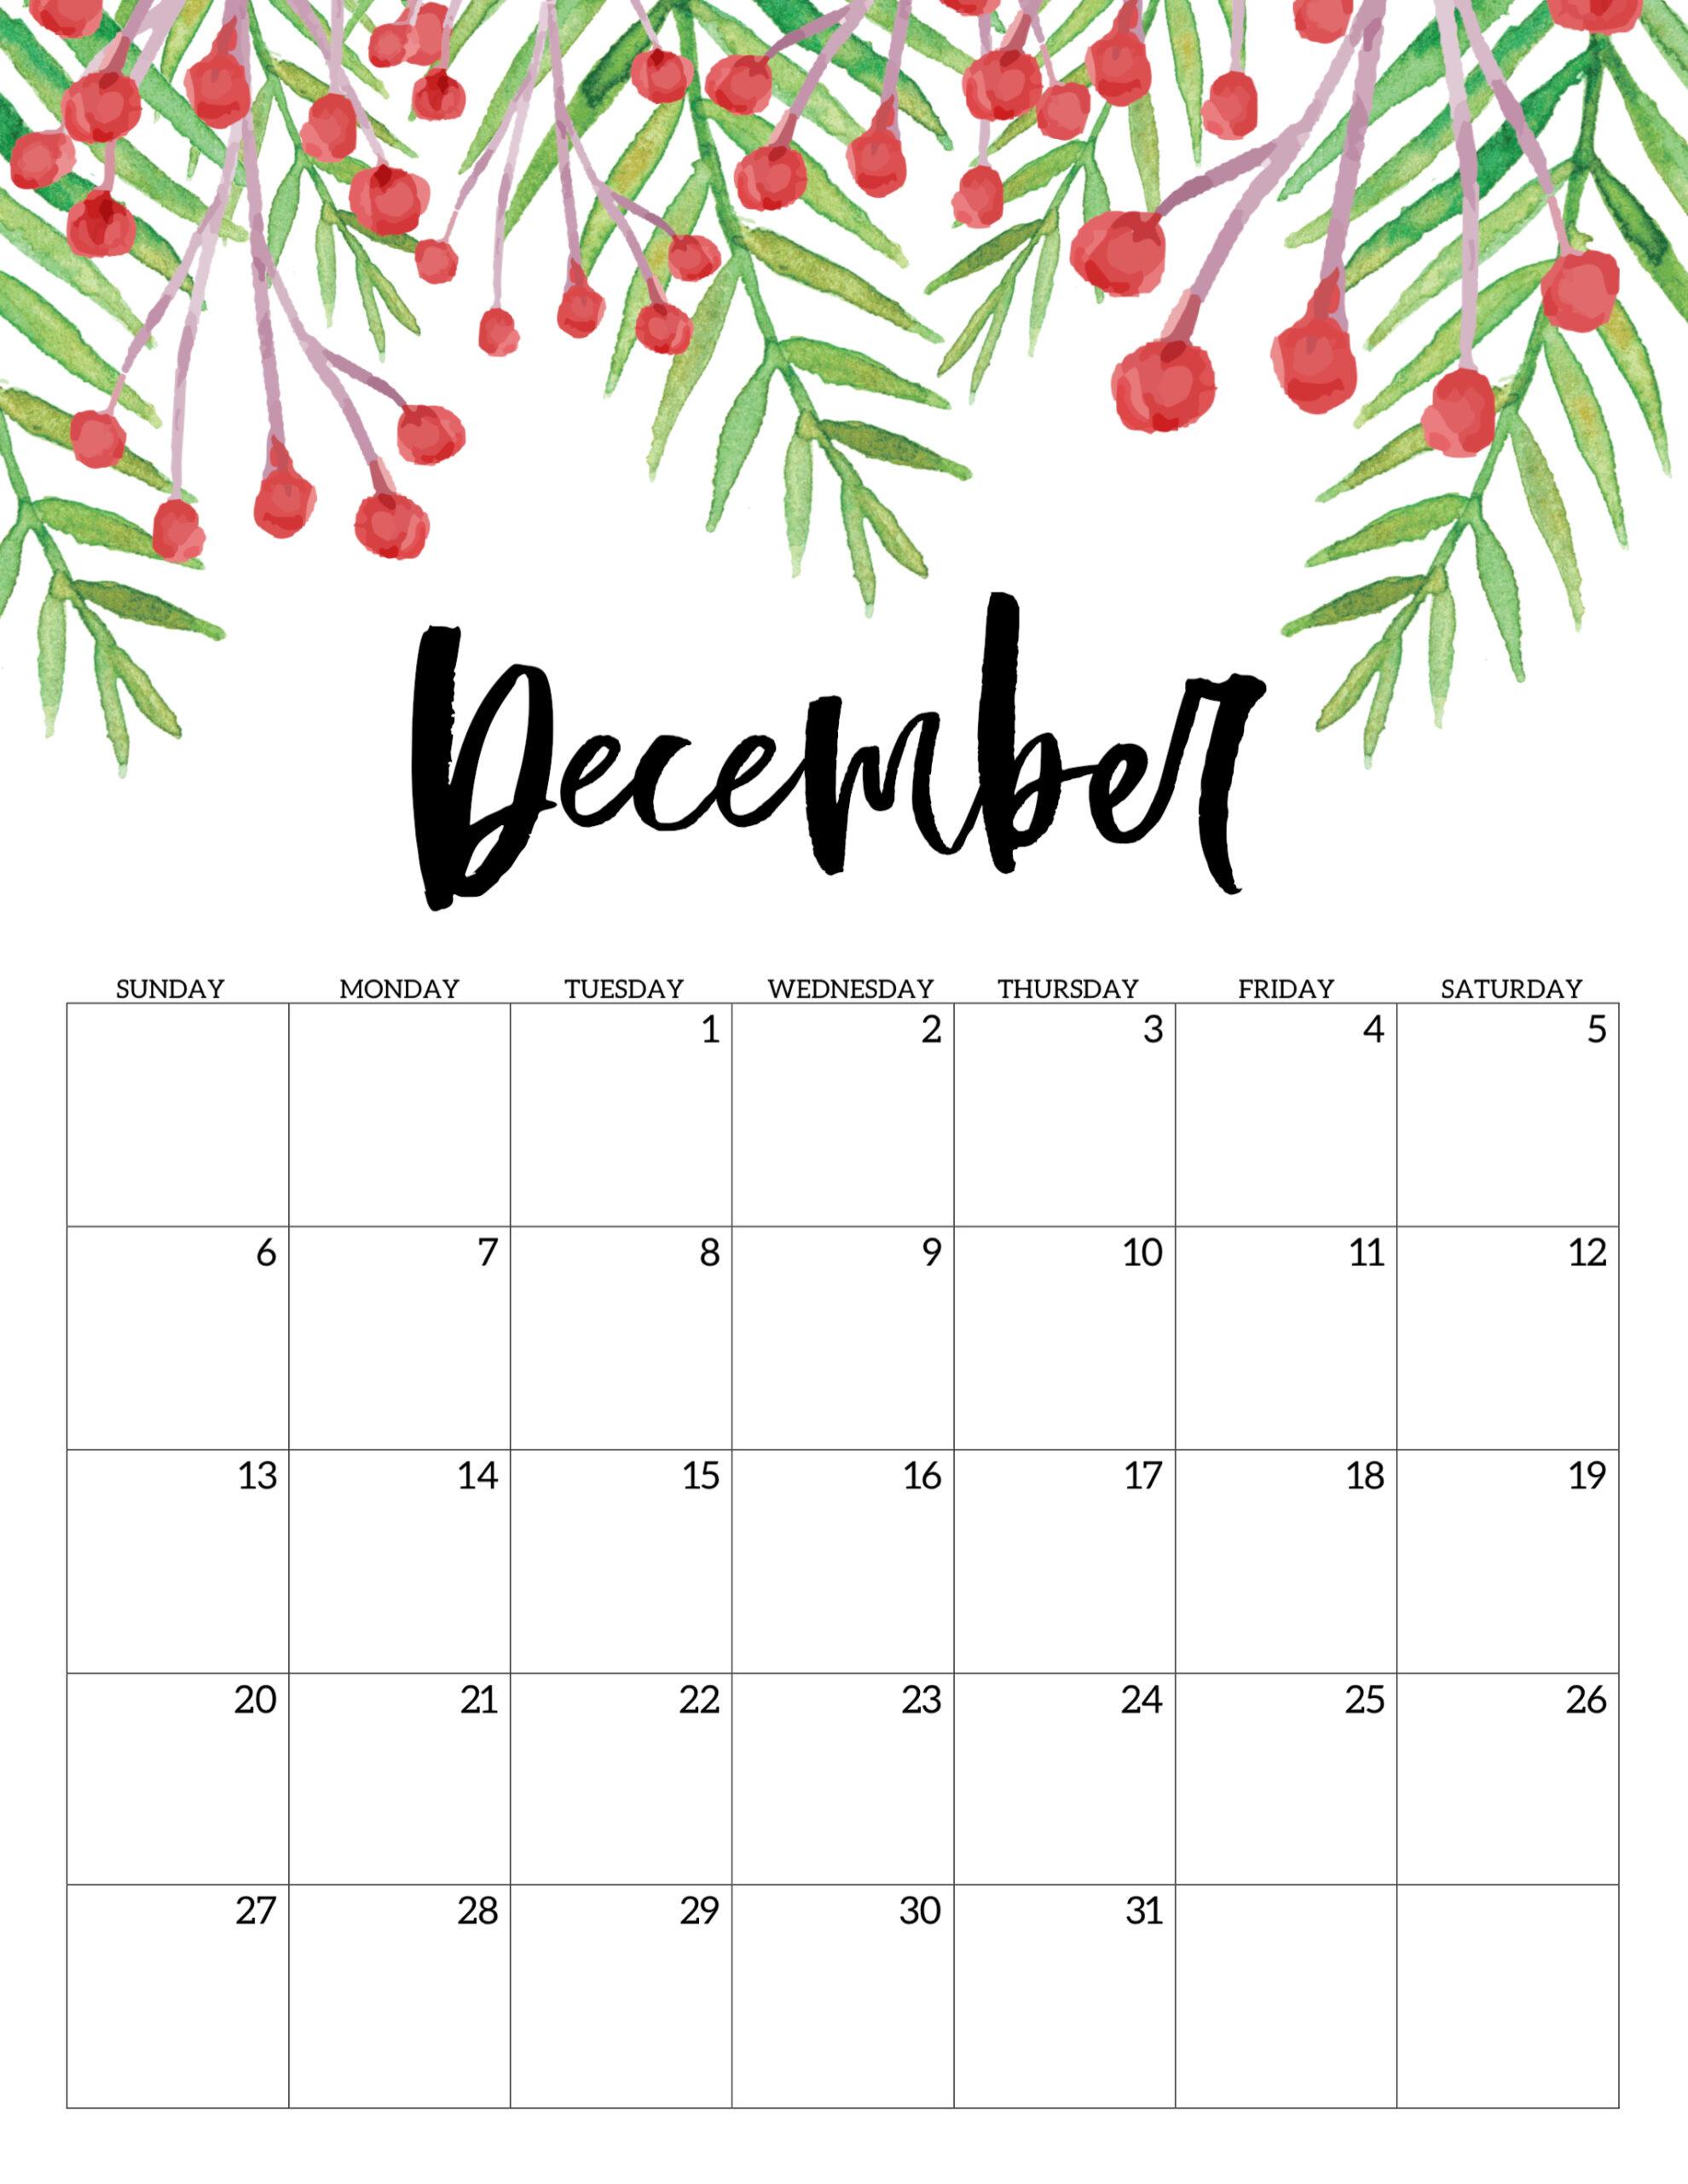 Printable December 2020 Calendar.Free Printable Calendar 2020 Floral Paper Trail Design